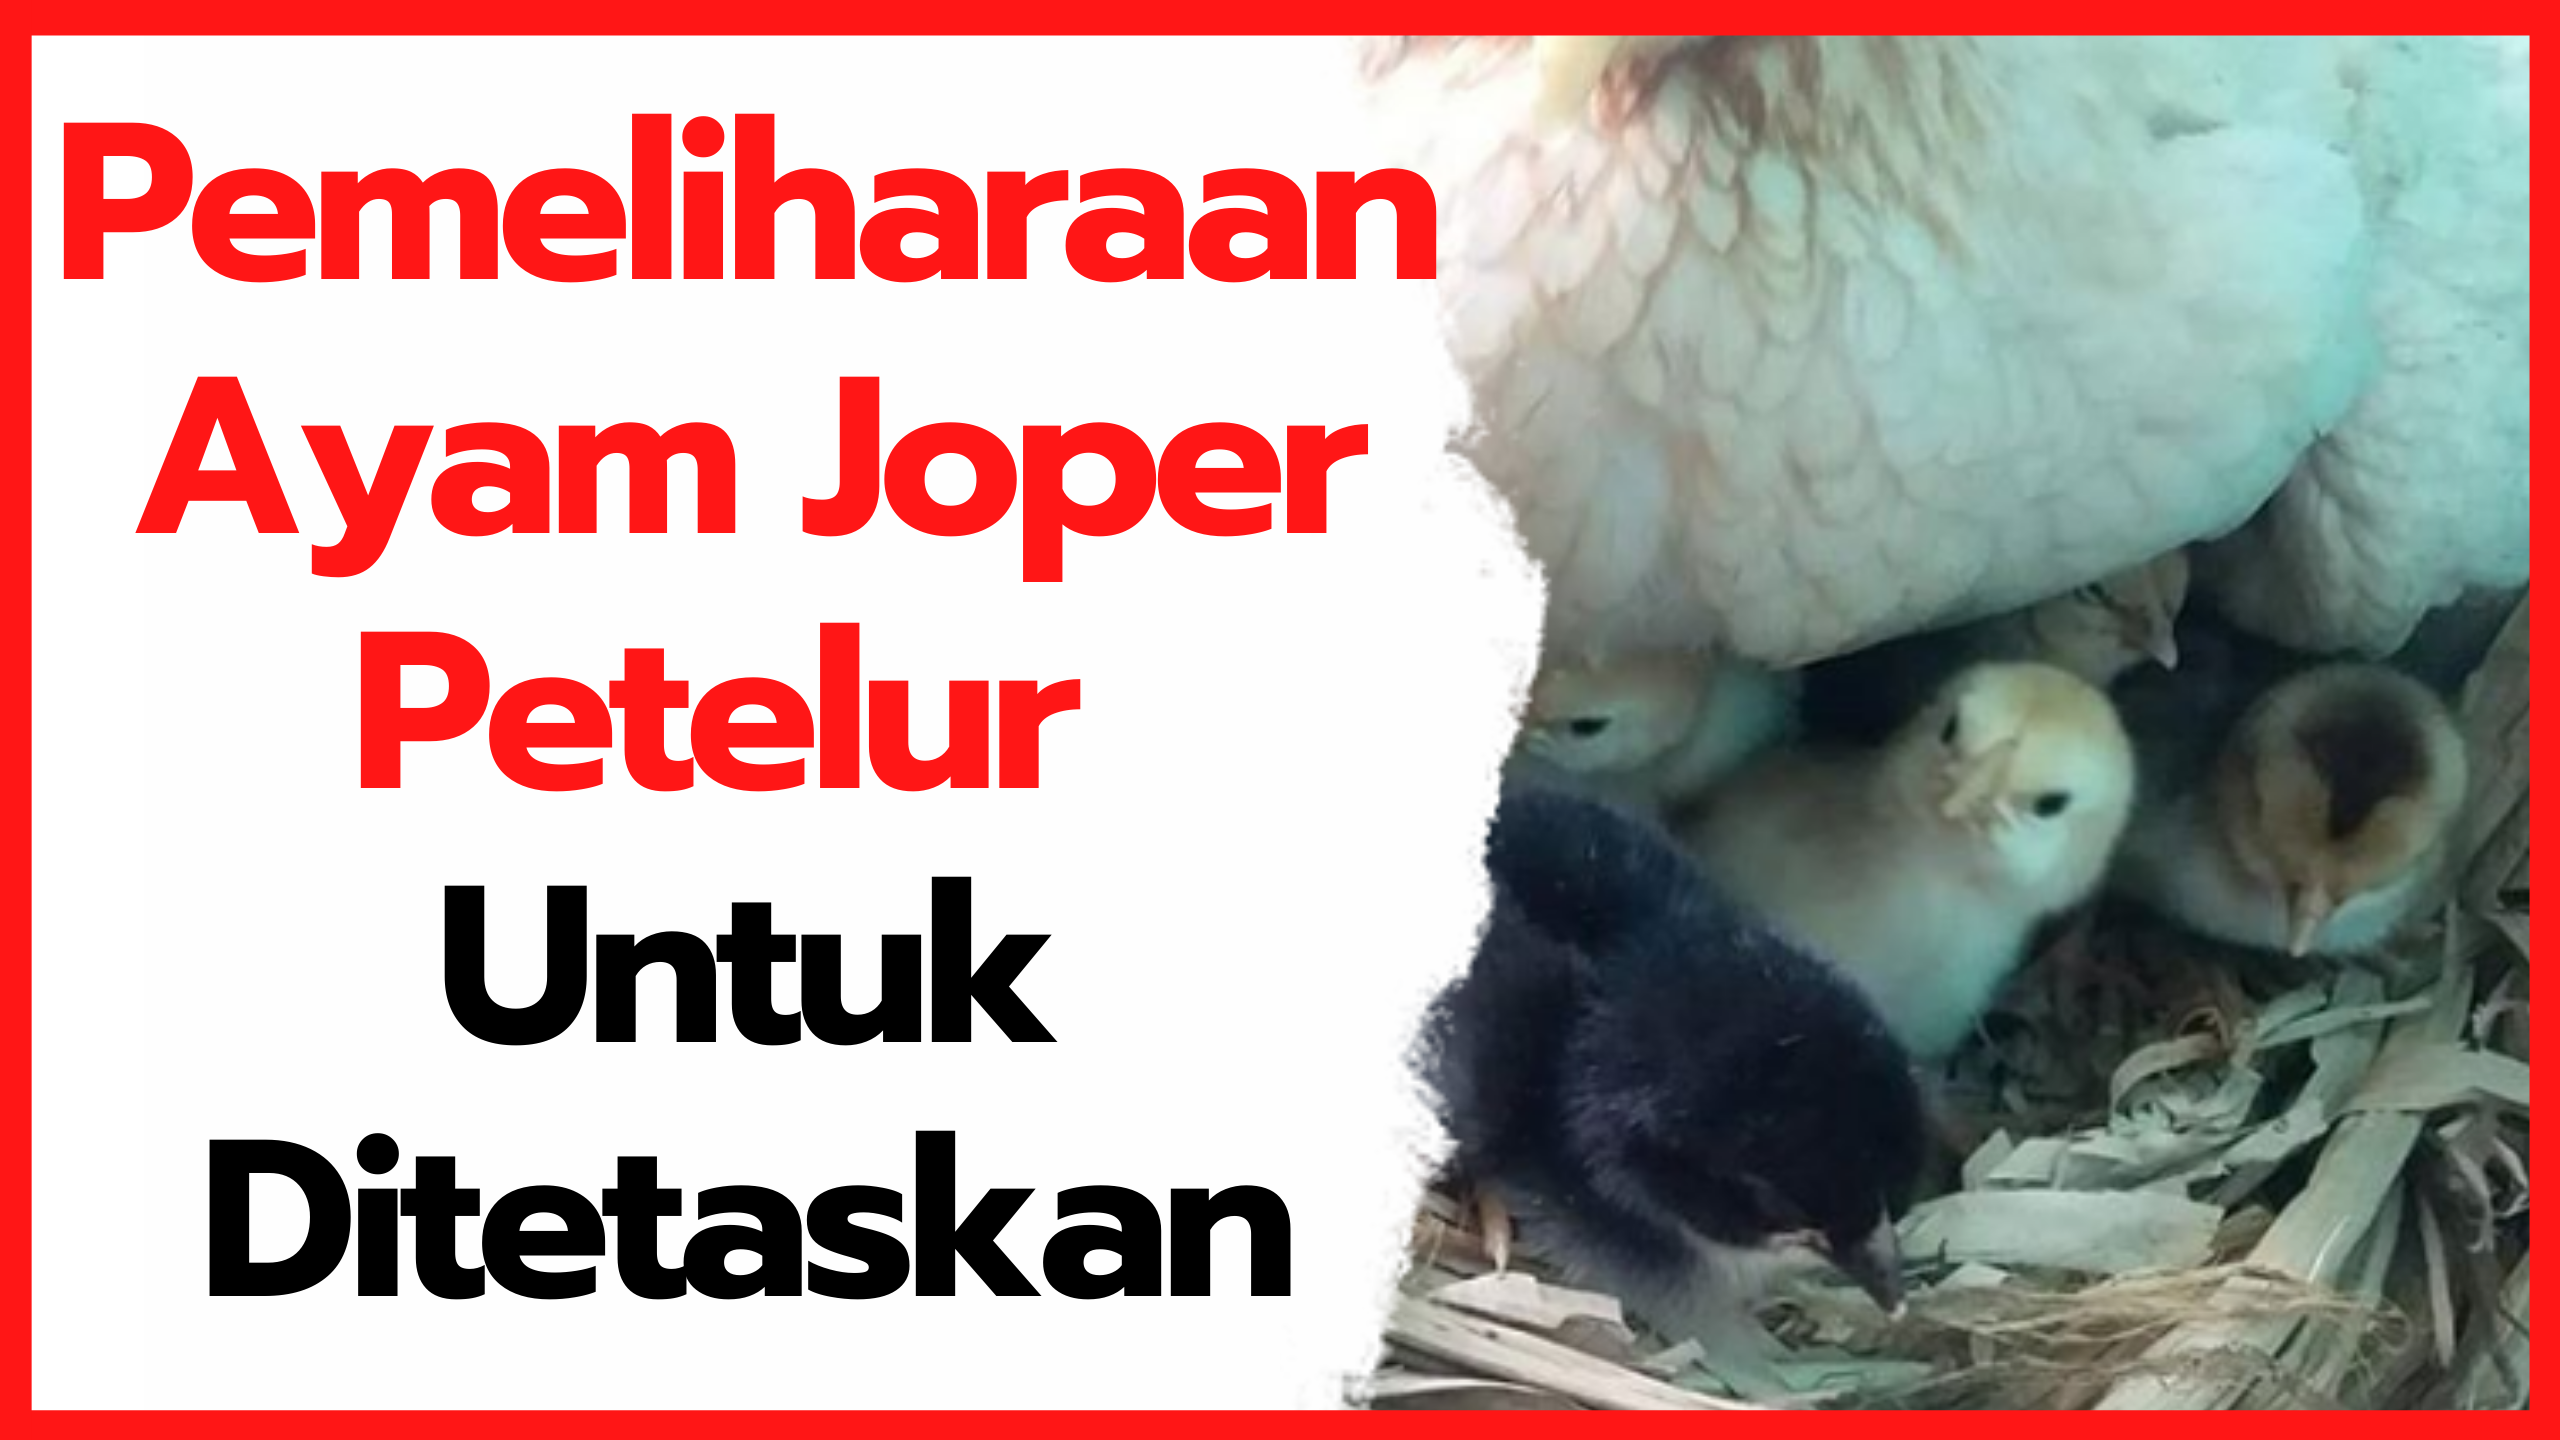 Pemeliharaan Ayam Joper Petelur Untuk Ditetaskan